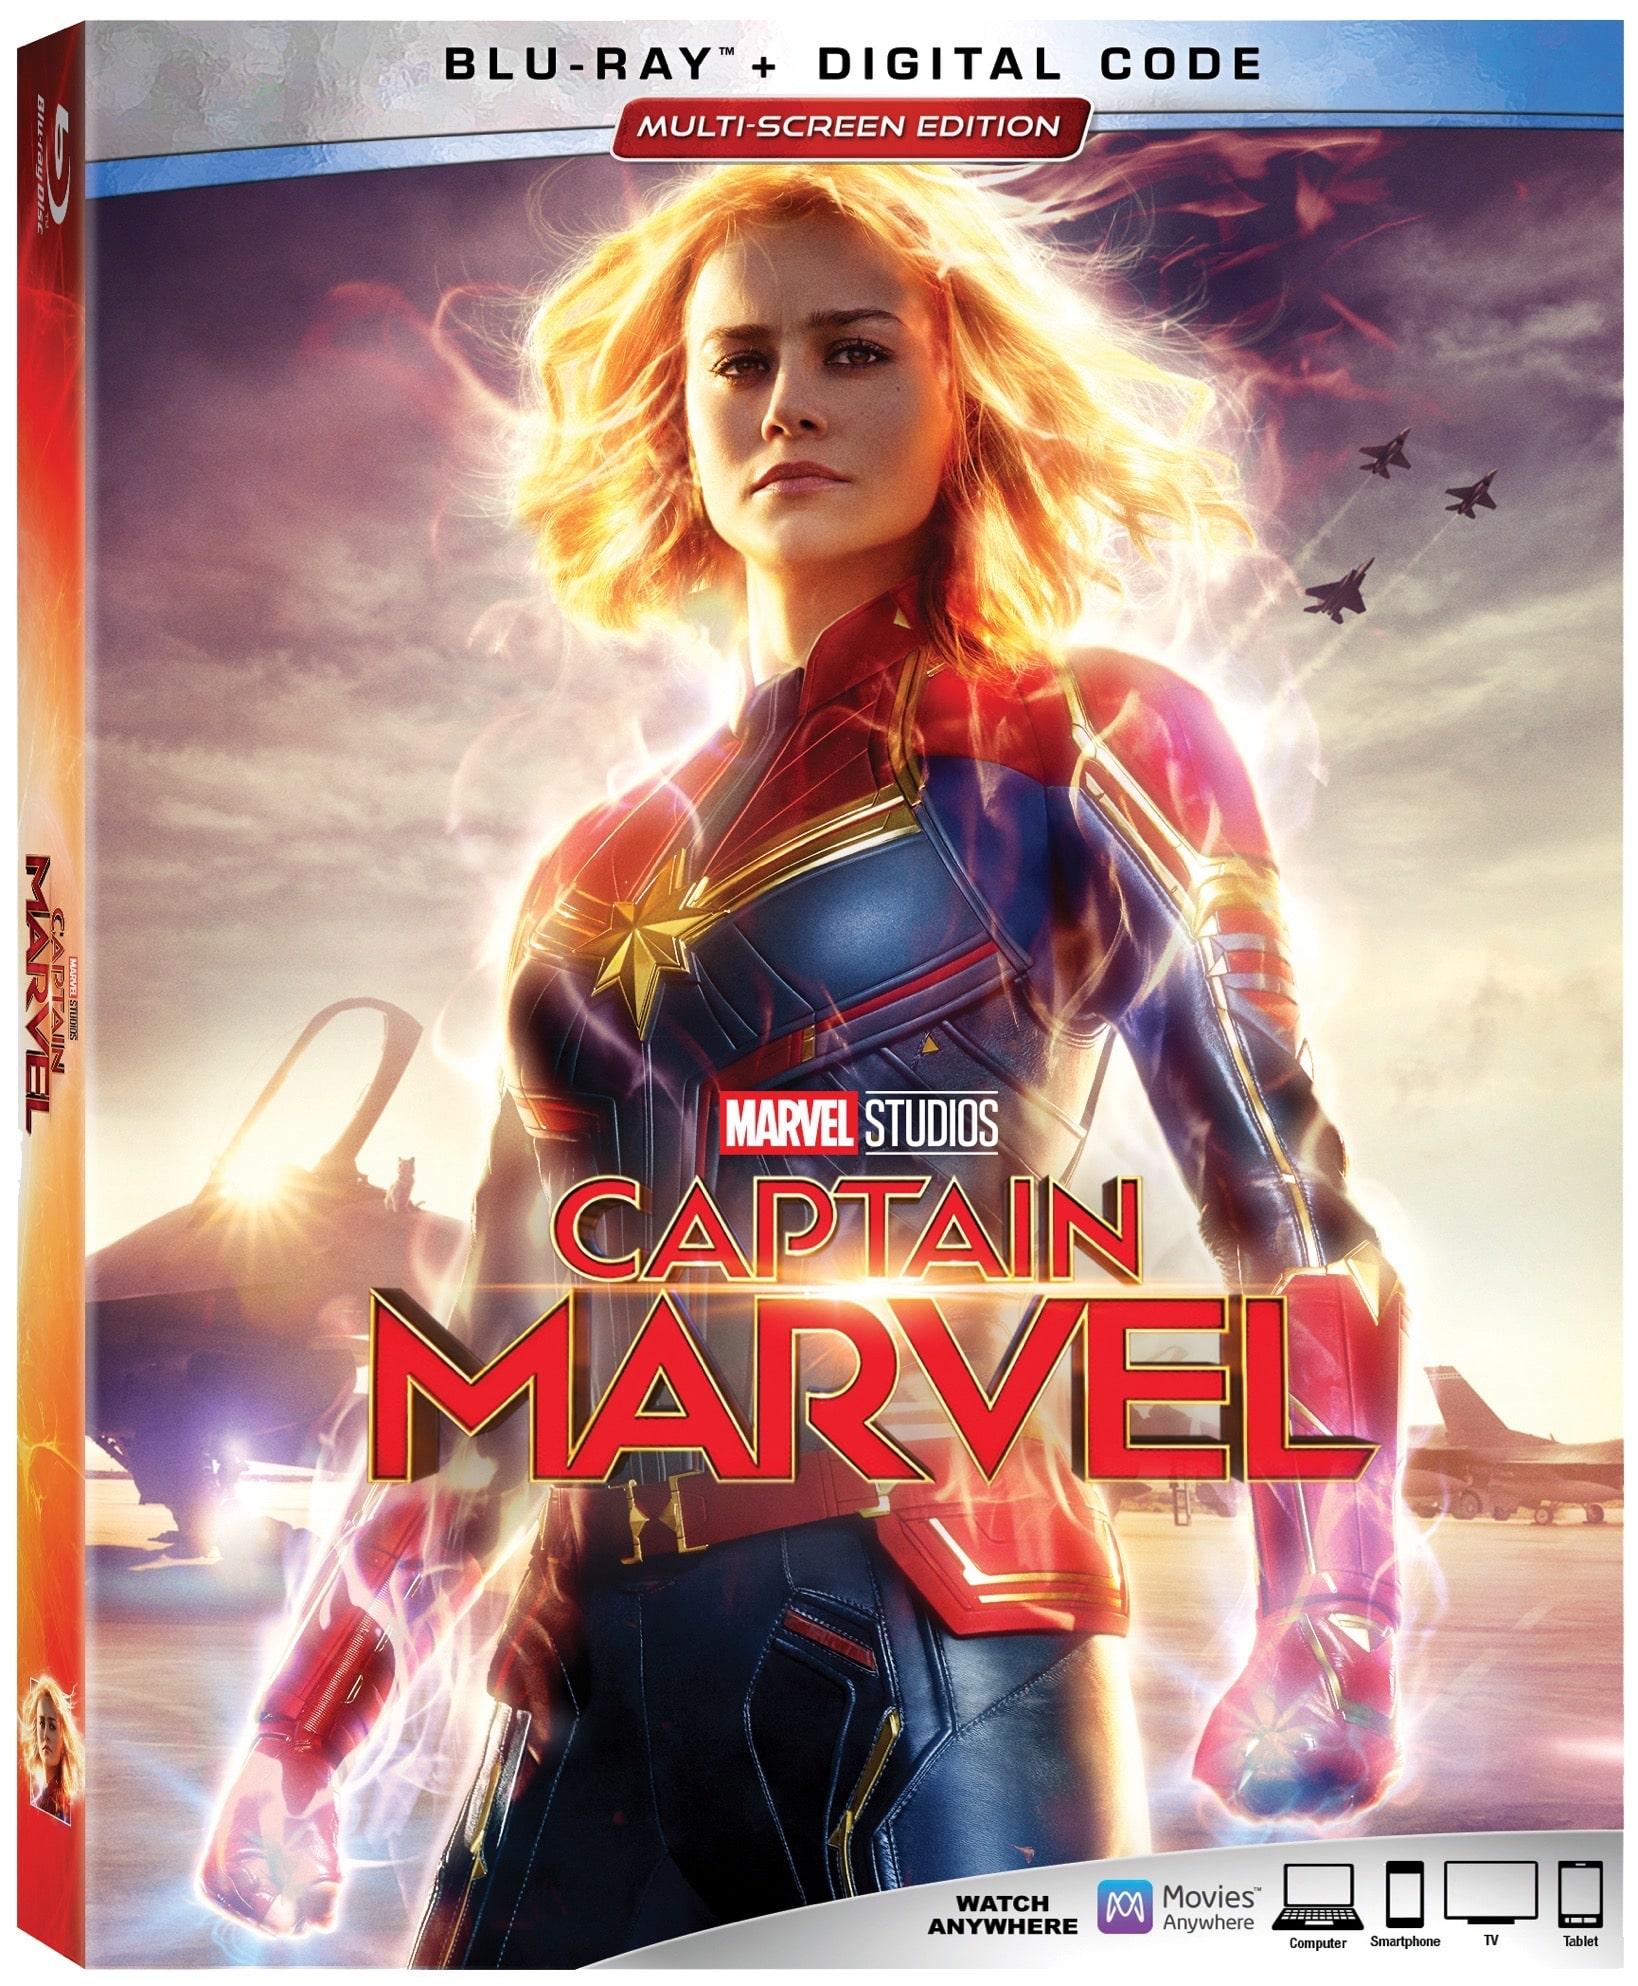 CaptainMarvel CoverArt Bluray